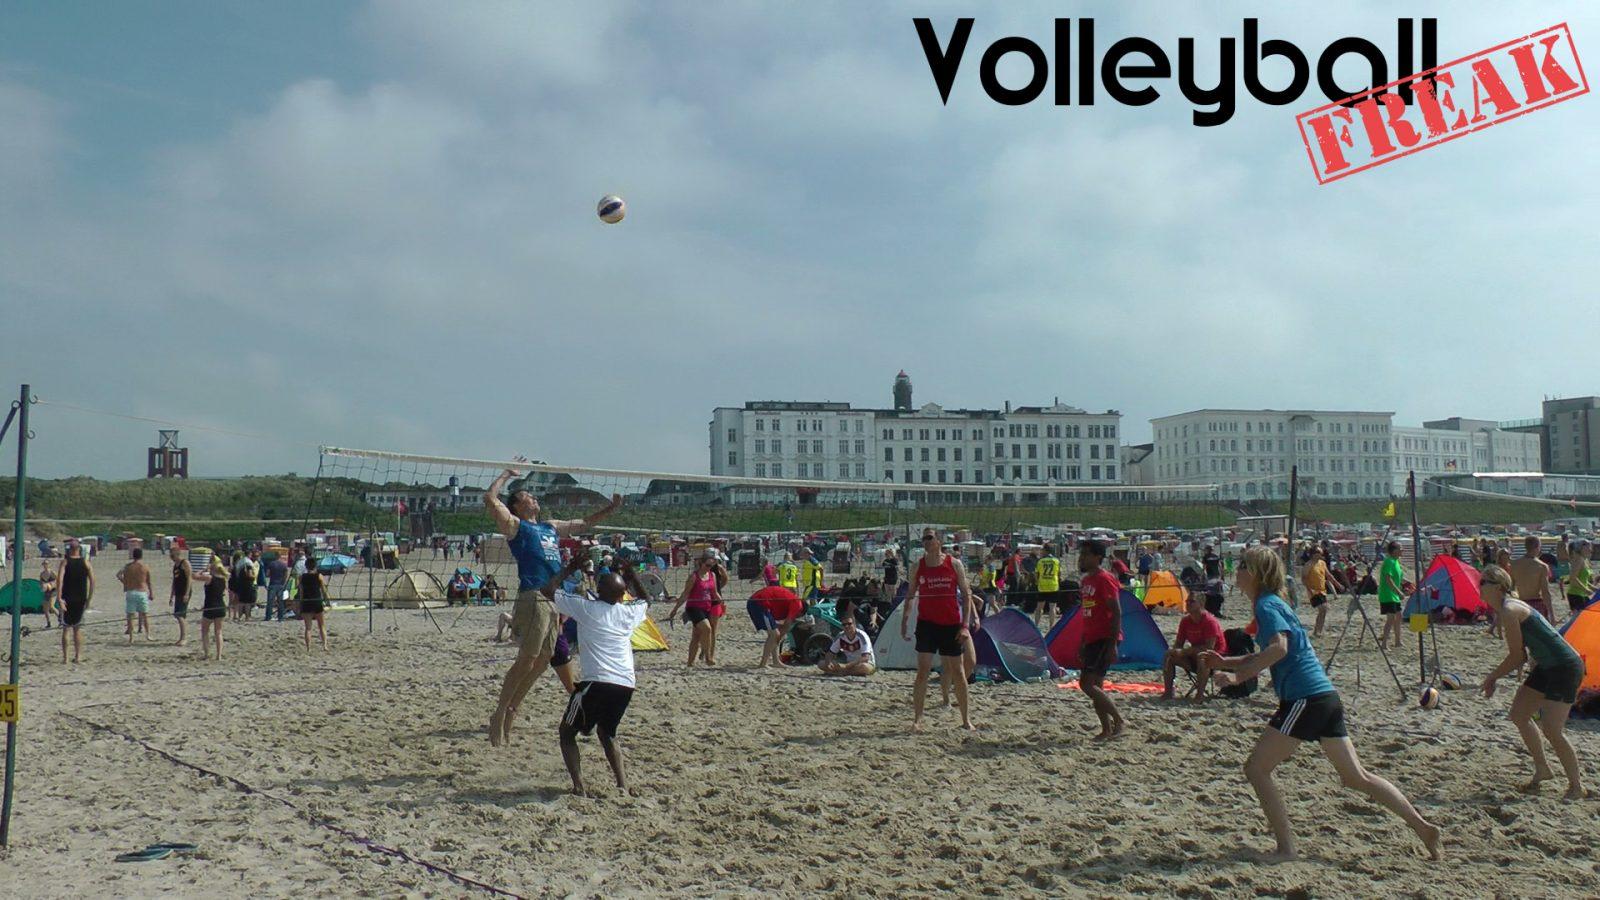 Beachvolleyball auf Borkum